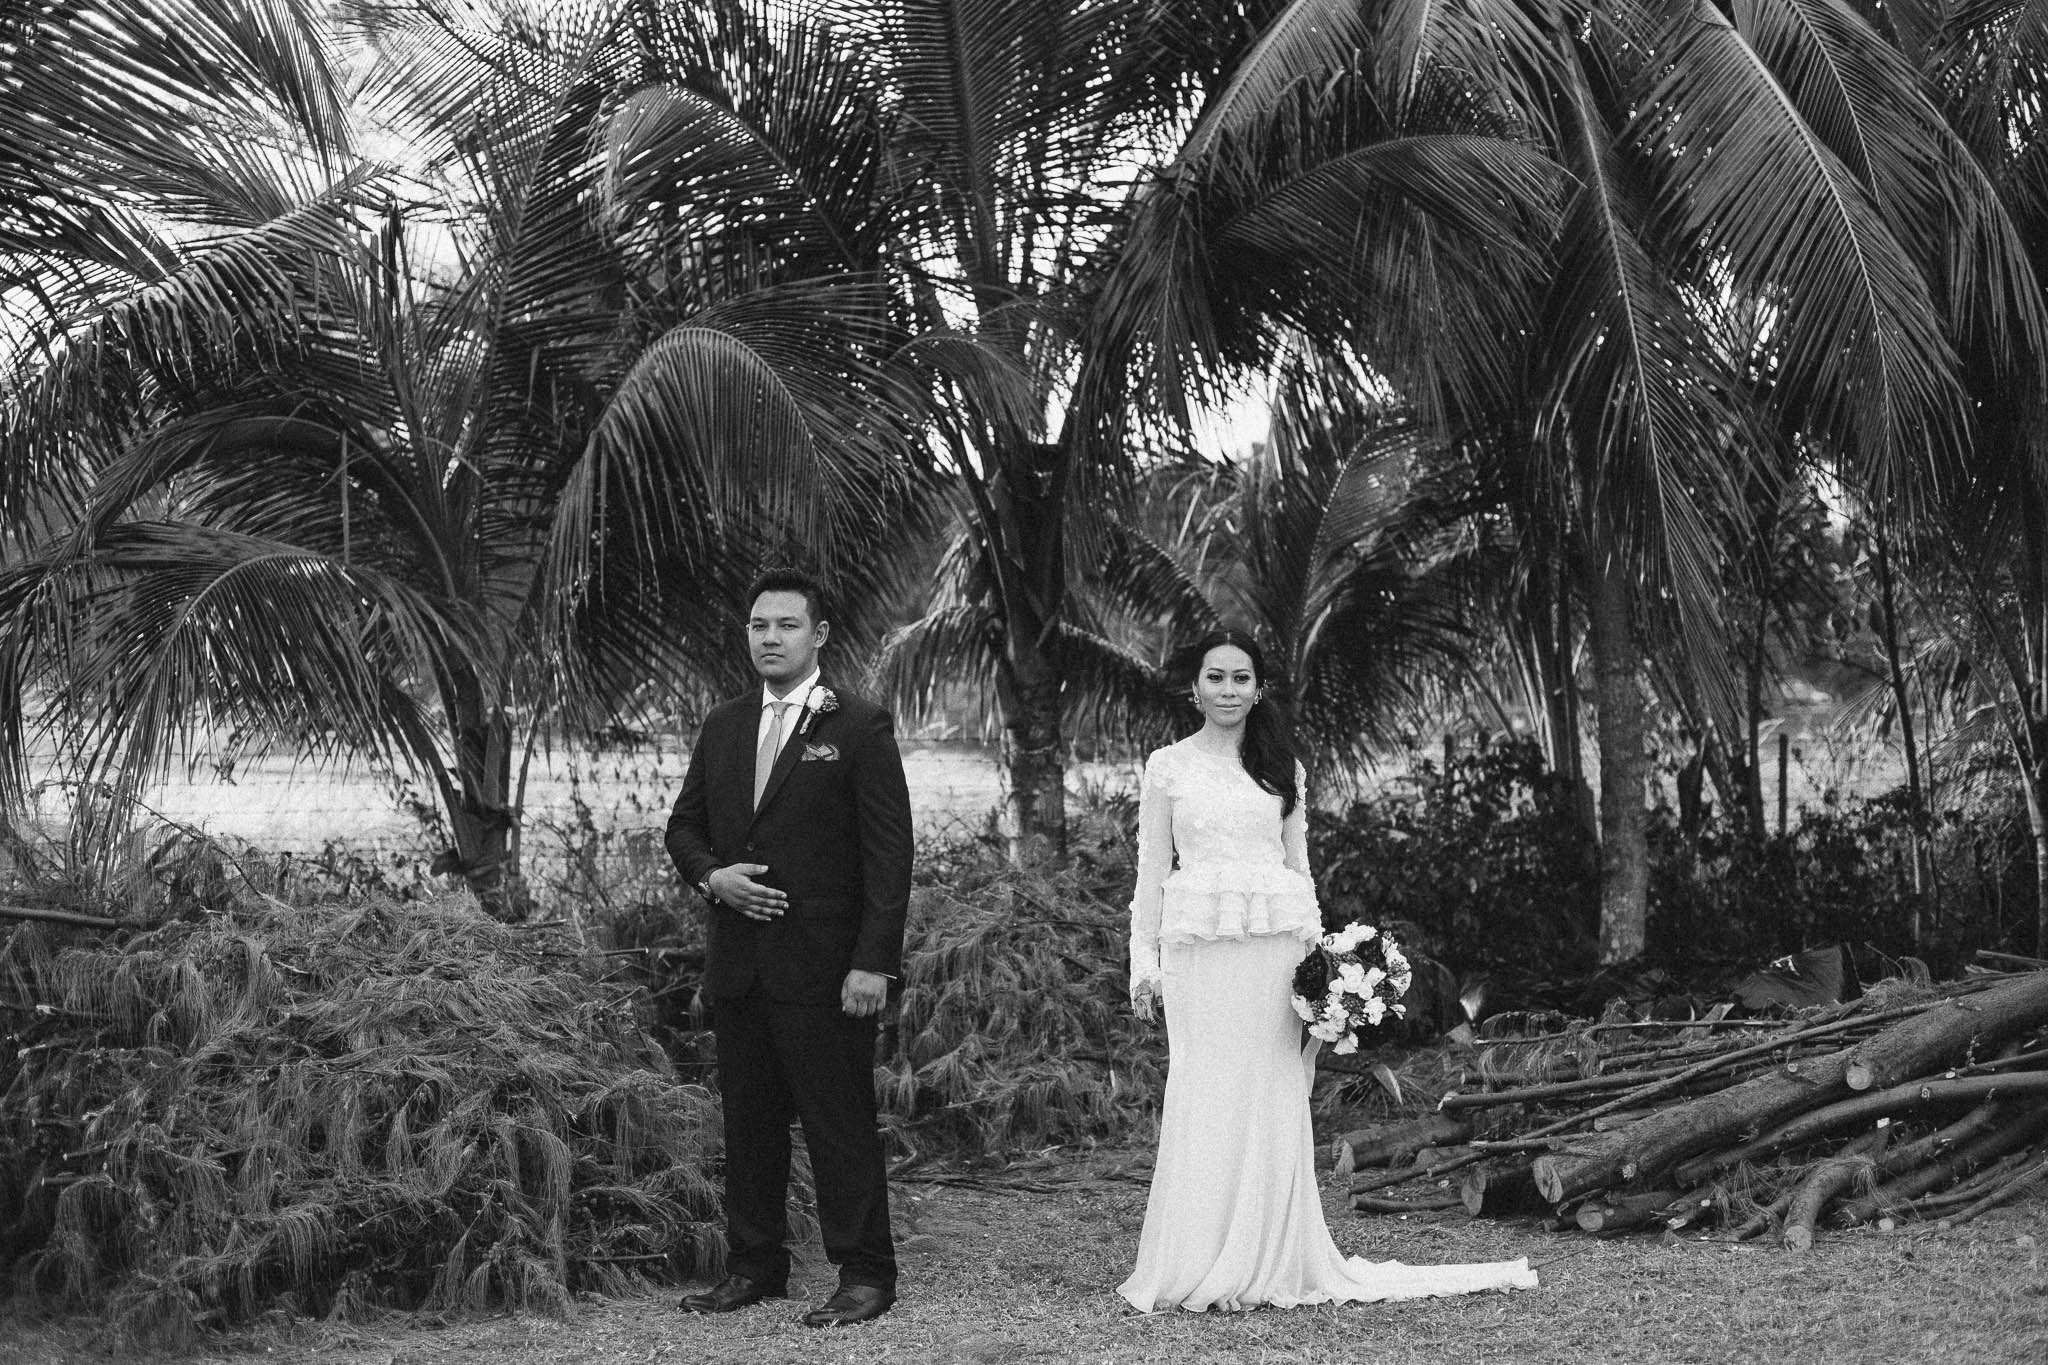 singapore-wedding-photographer-malay-indian-pre-wedding-travel-wmt-2015-75.jpg